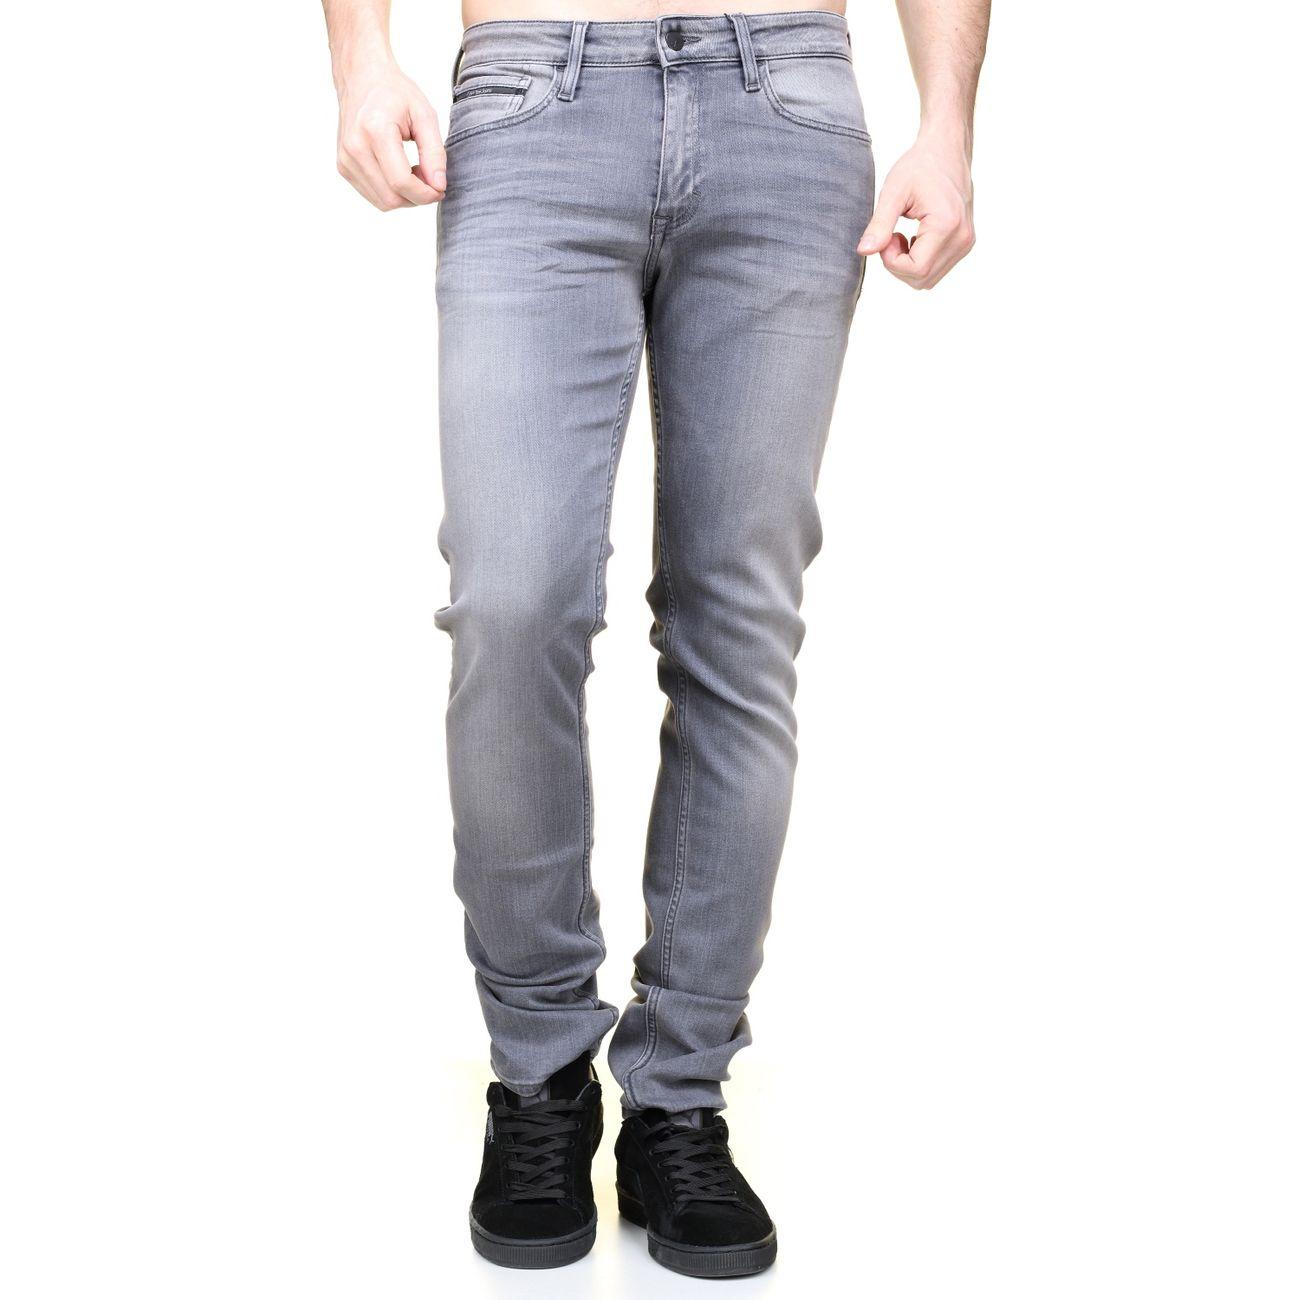 6df10afc0114 jeans-calvin-klein-j30j304295-slim-straight-903-gris 1 v2.jpeg